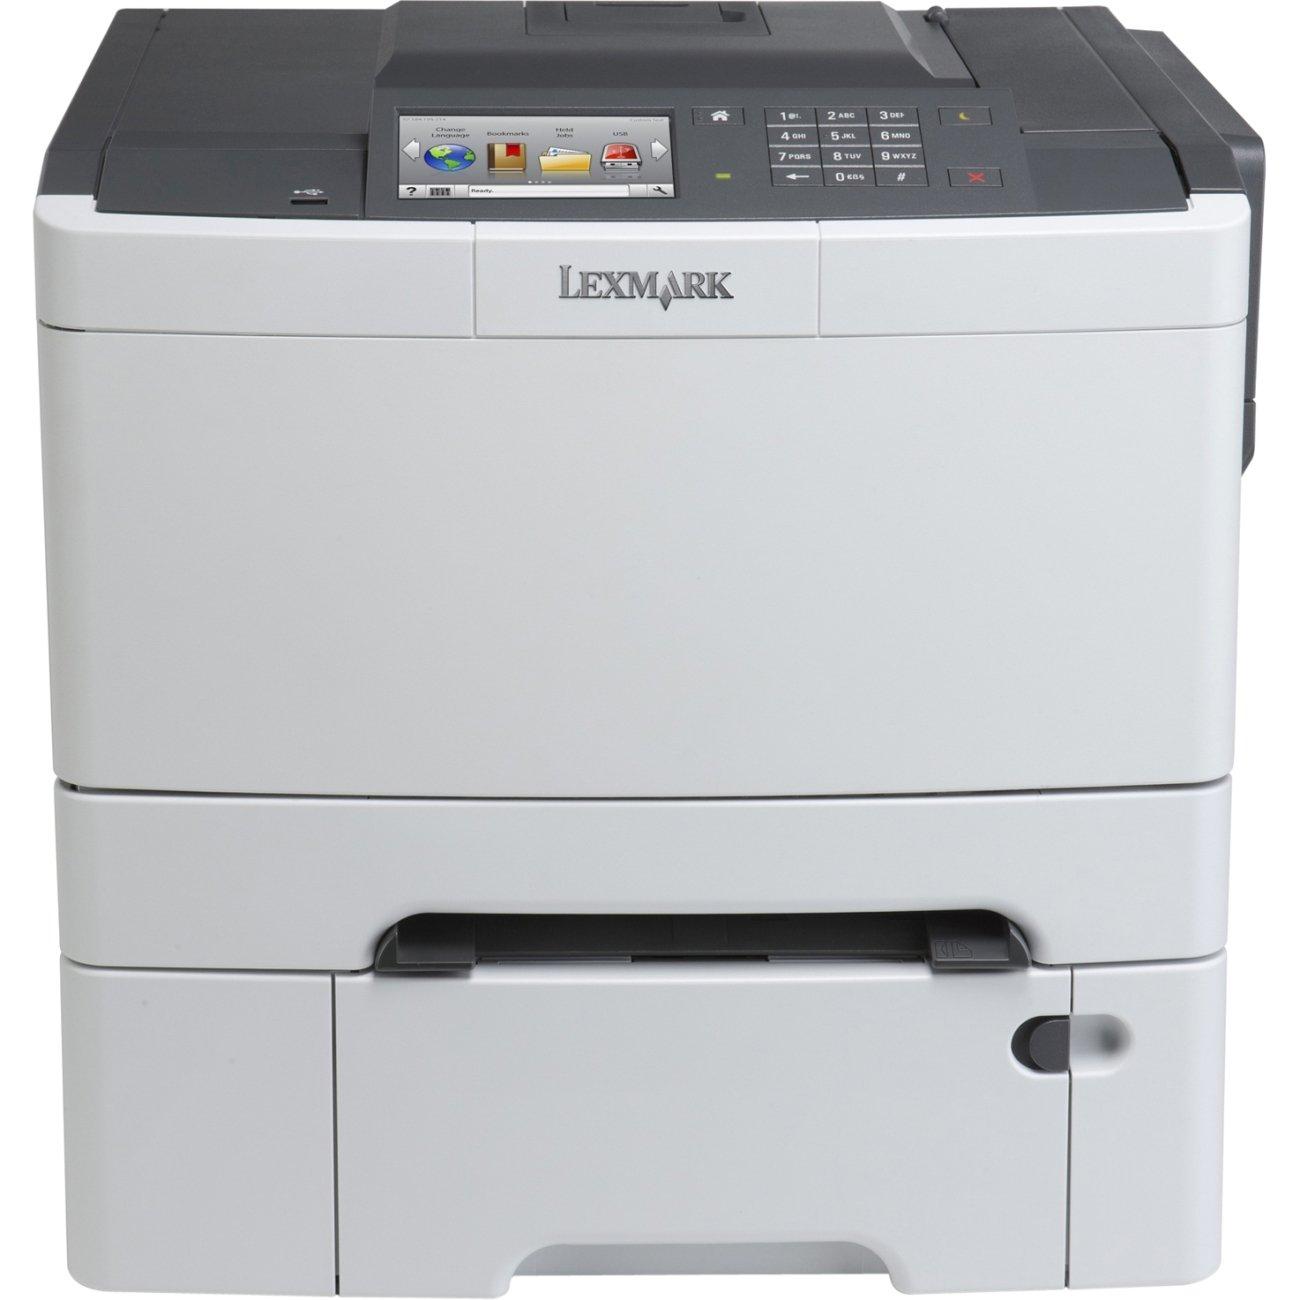 Amazon Lexmark CS510dte 28E0100 Laser Color Printer Black Grey Office Products